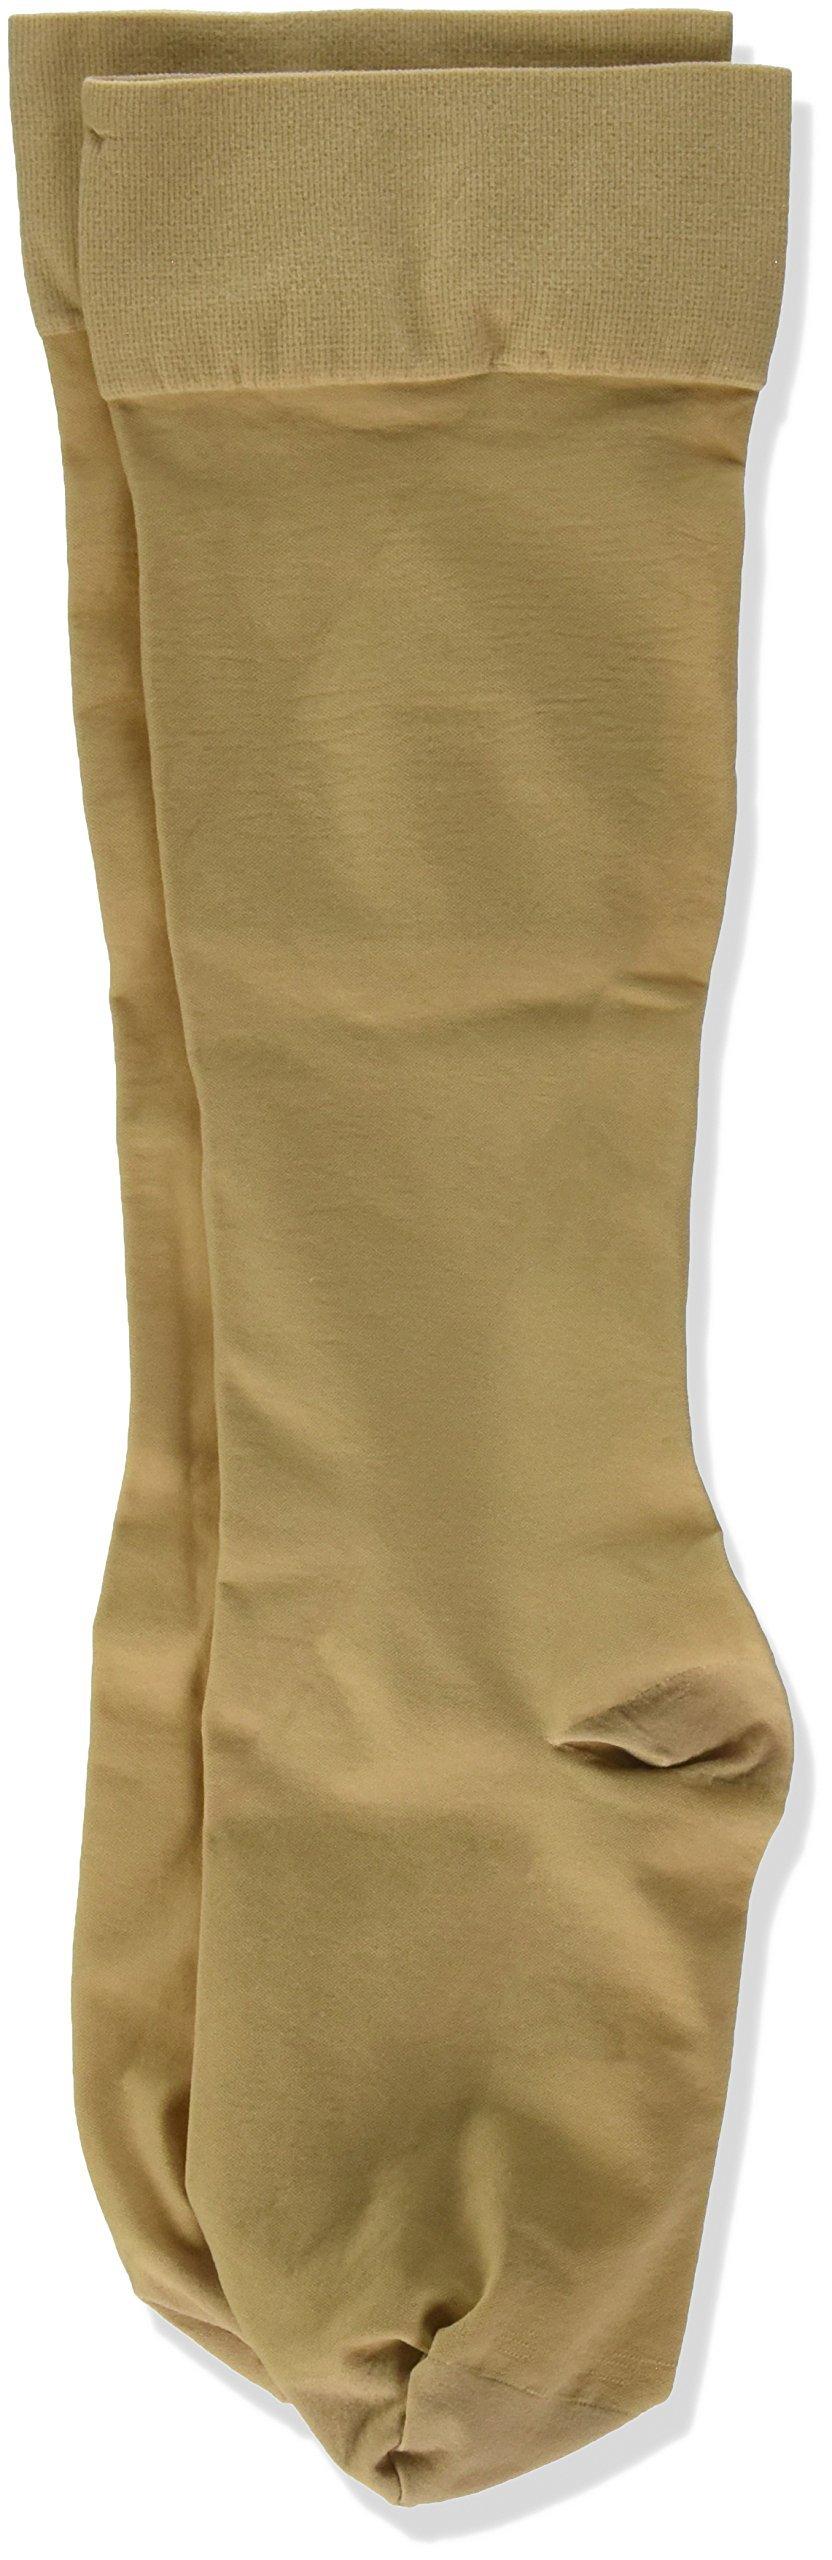 Jobst Women's UltraSheer Moderate Support Knee Highs, Large, beige